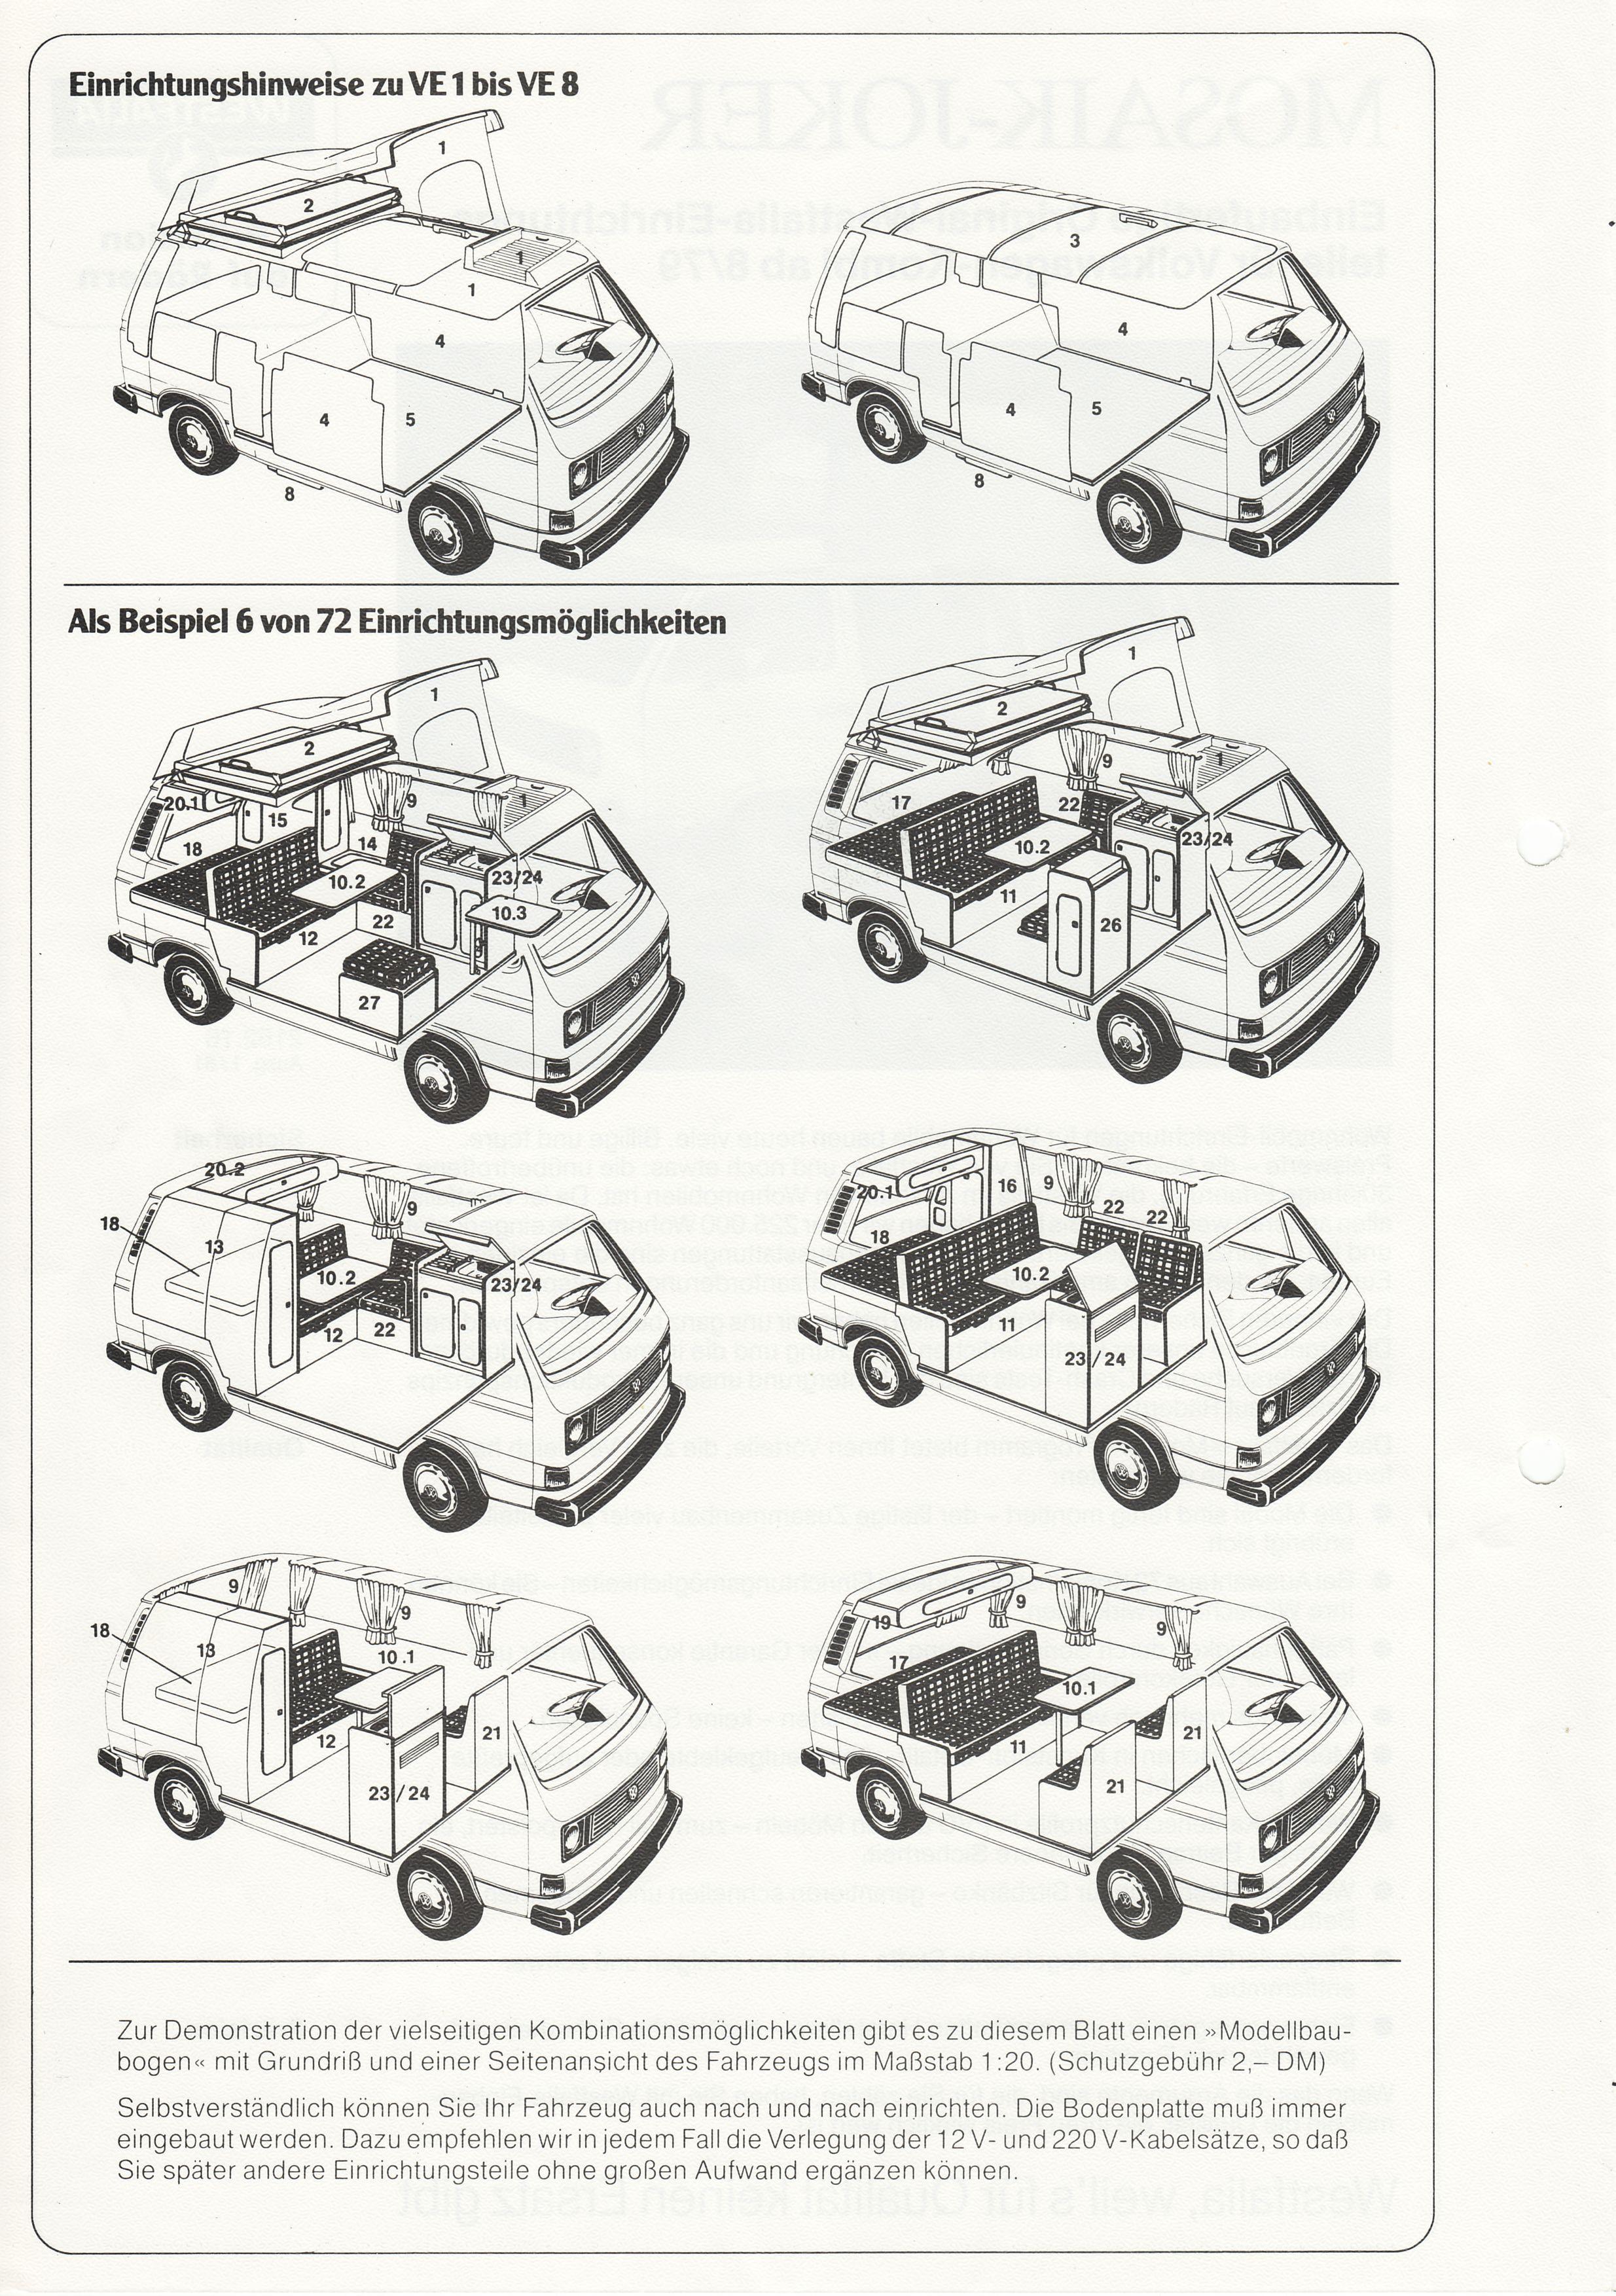 mosaik westfalia t3 westfalia vw syncro vw camper und vw bus t3. Black Bedroom Furniture Sets. Home Design Ideas